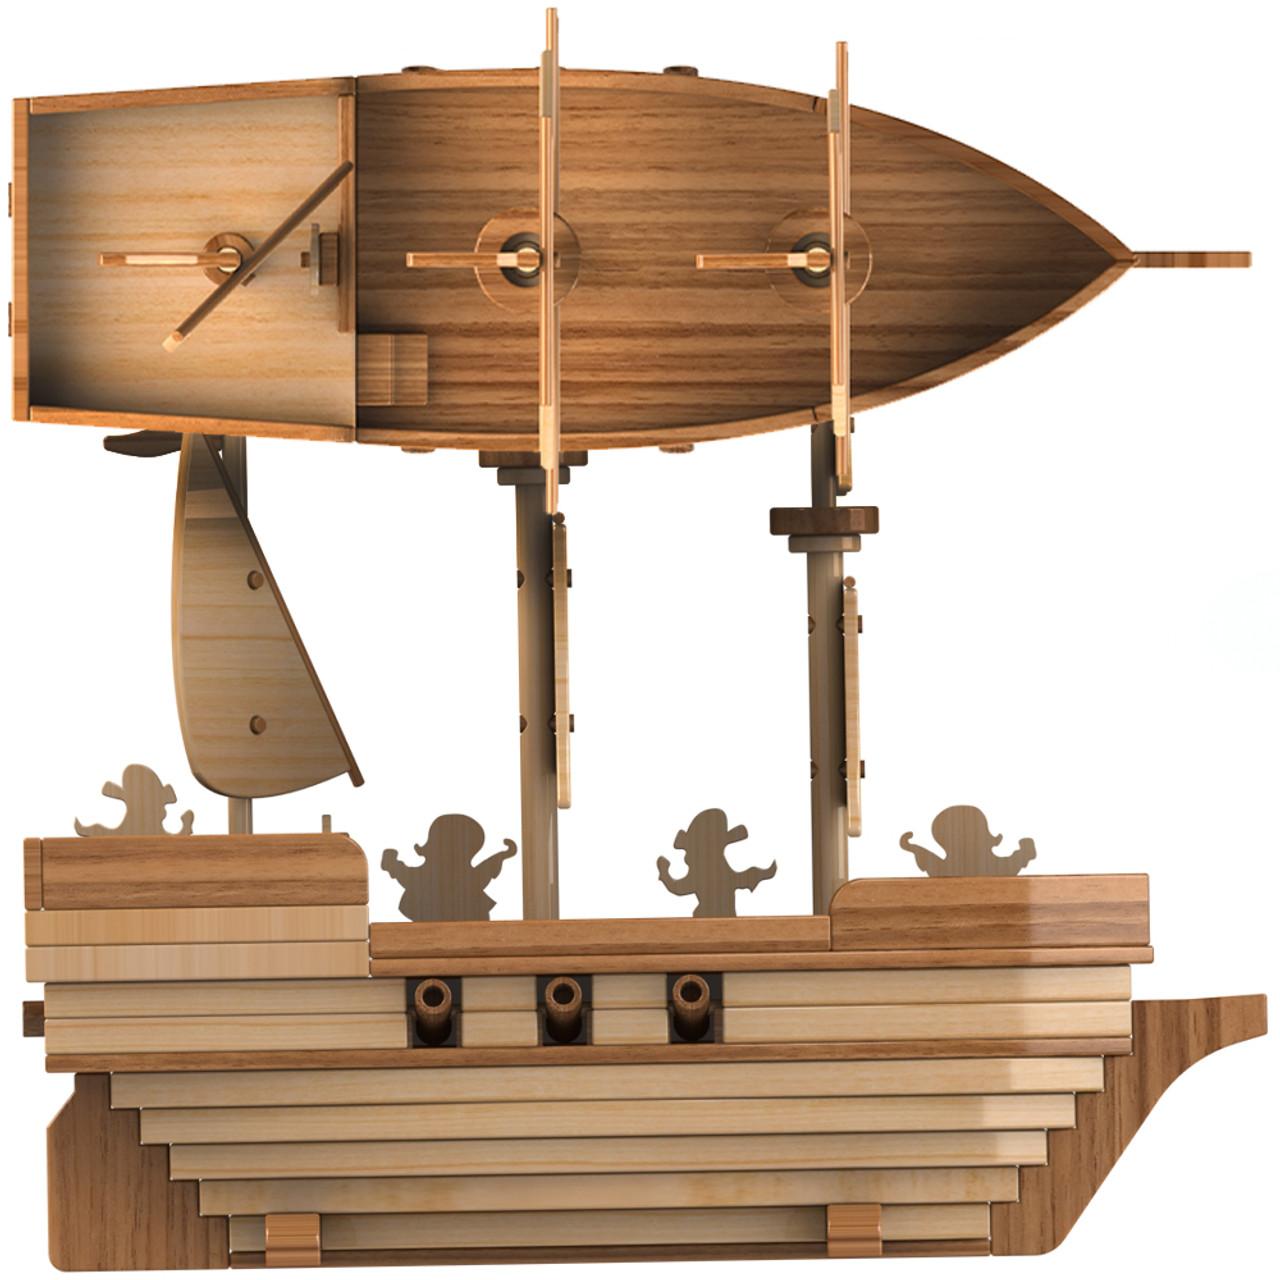 scroll saw magic pirate ship madagascar wood toy plans (pdf download)